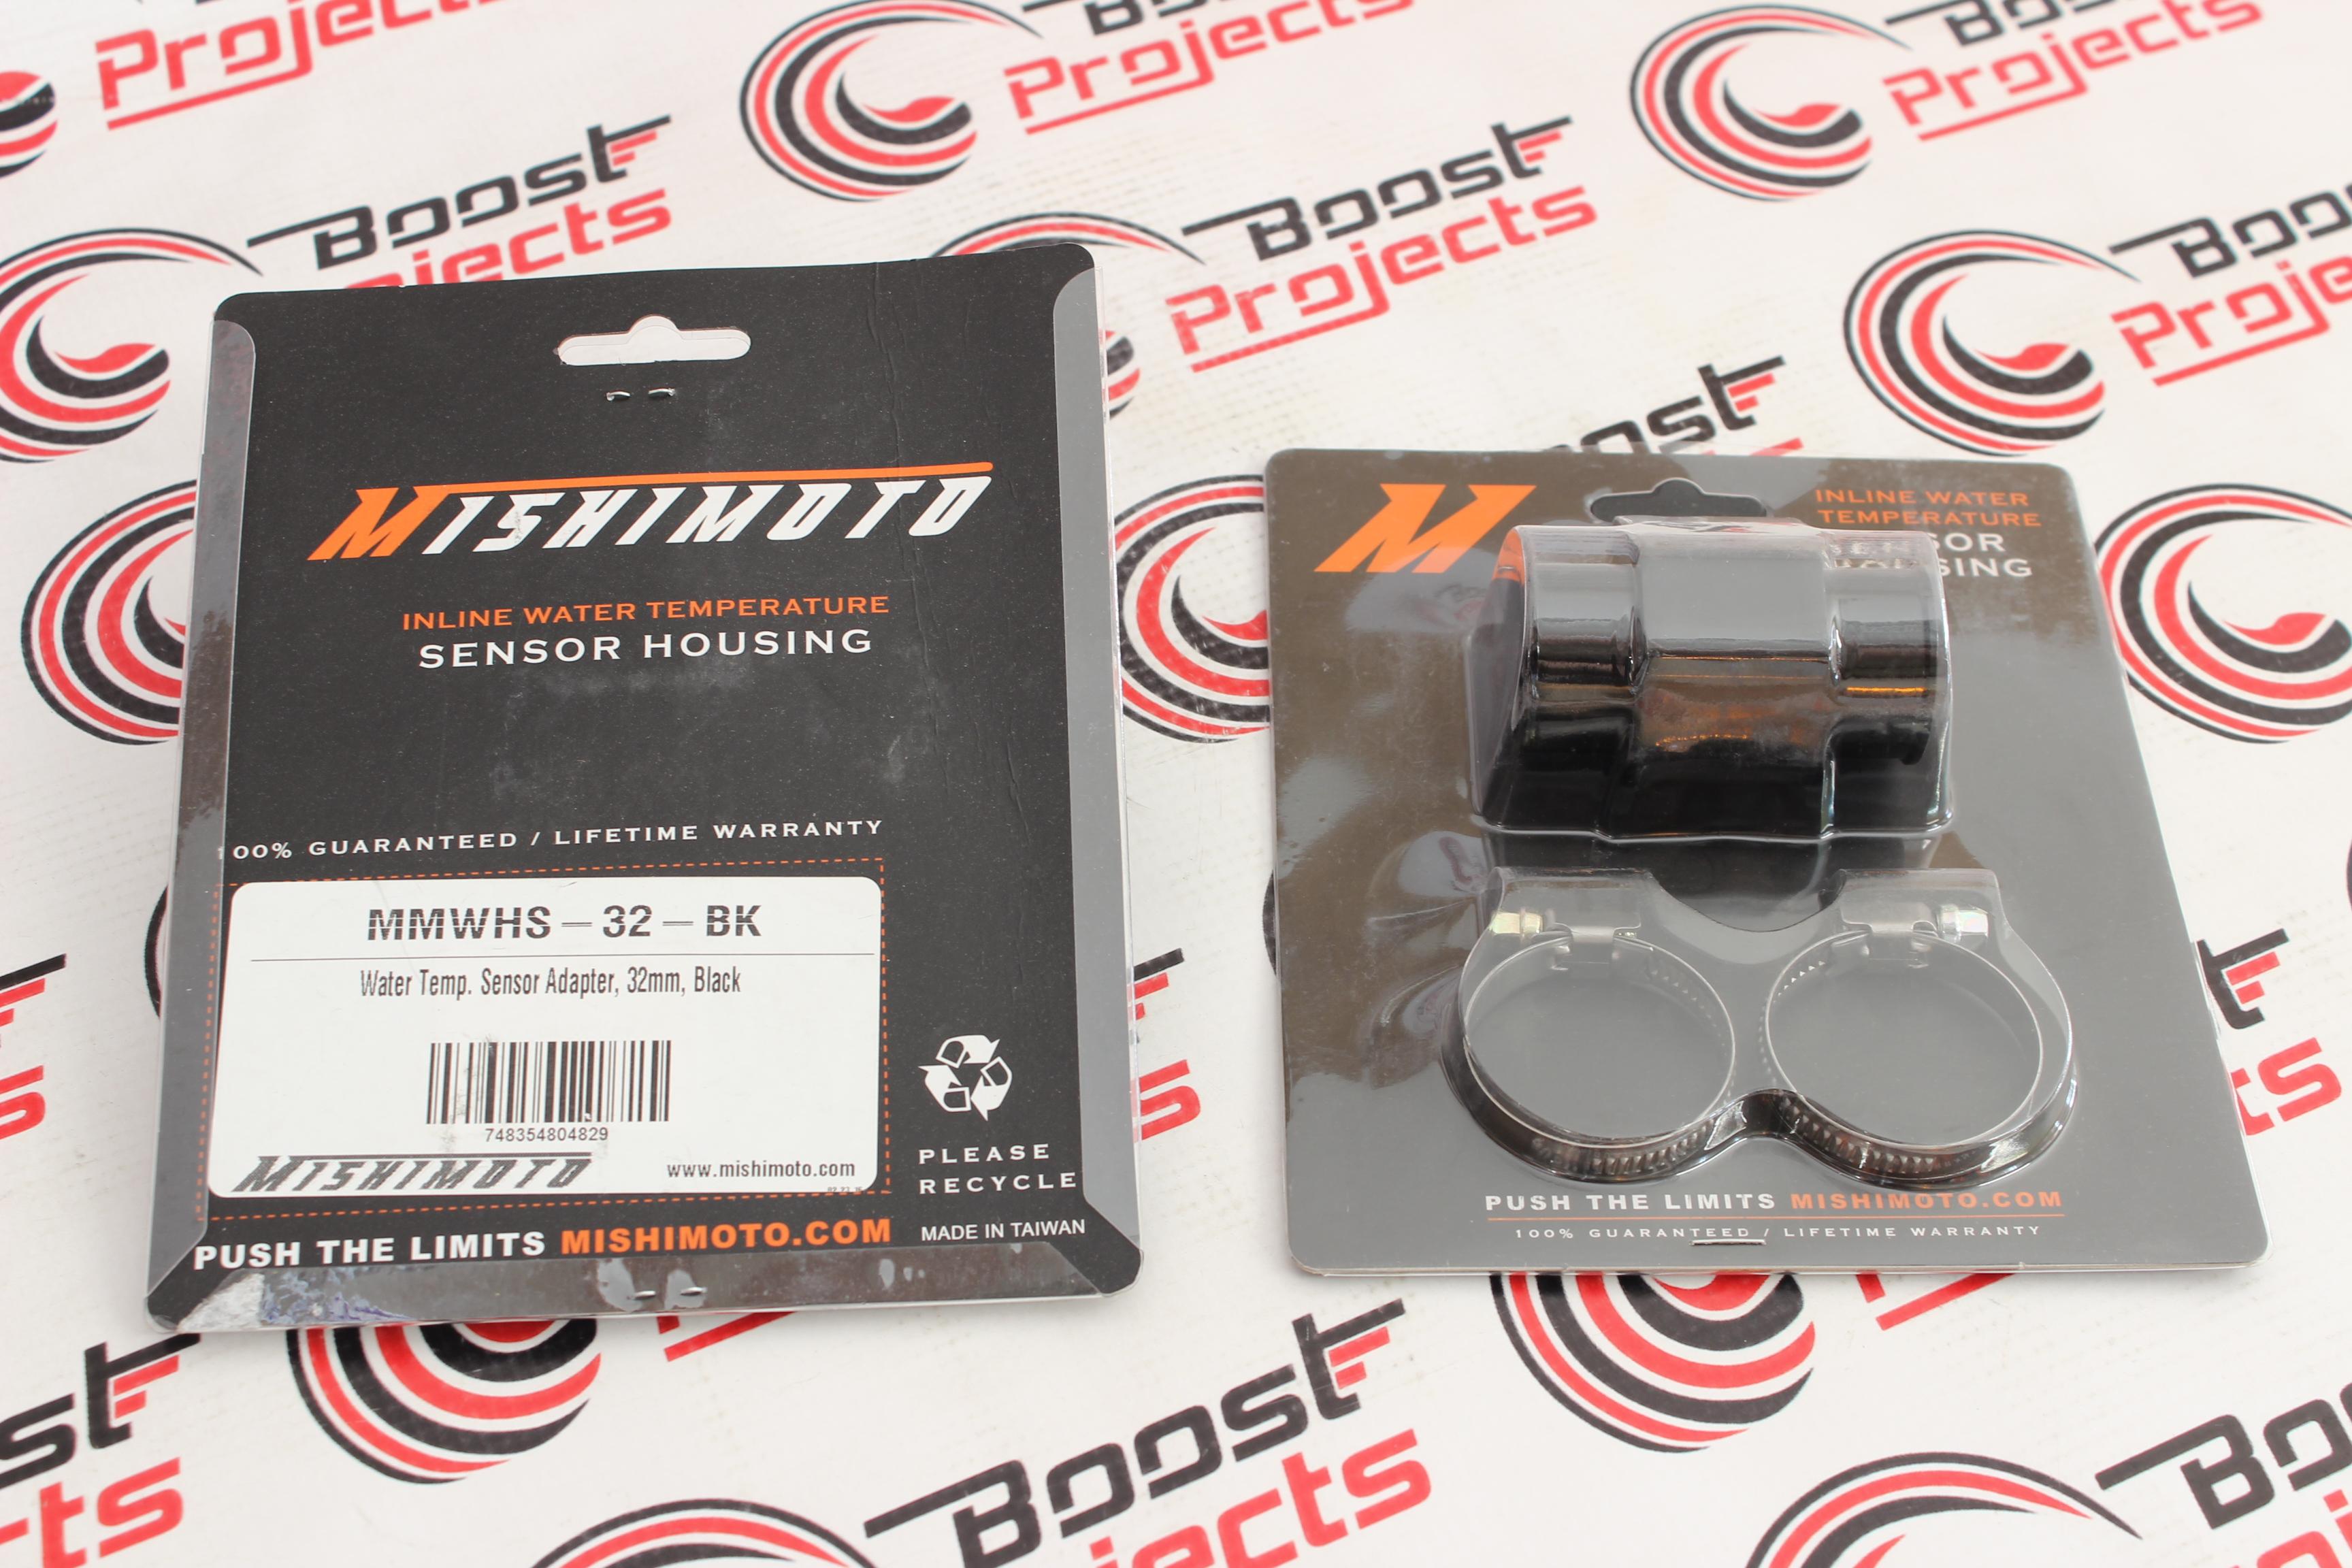 34mm Universal Mishimoto MMWHS-34-BK Water Temperature Sensor Adapter